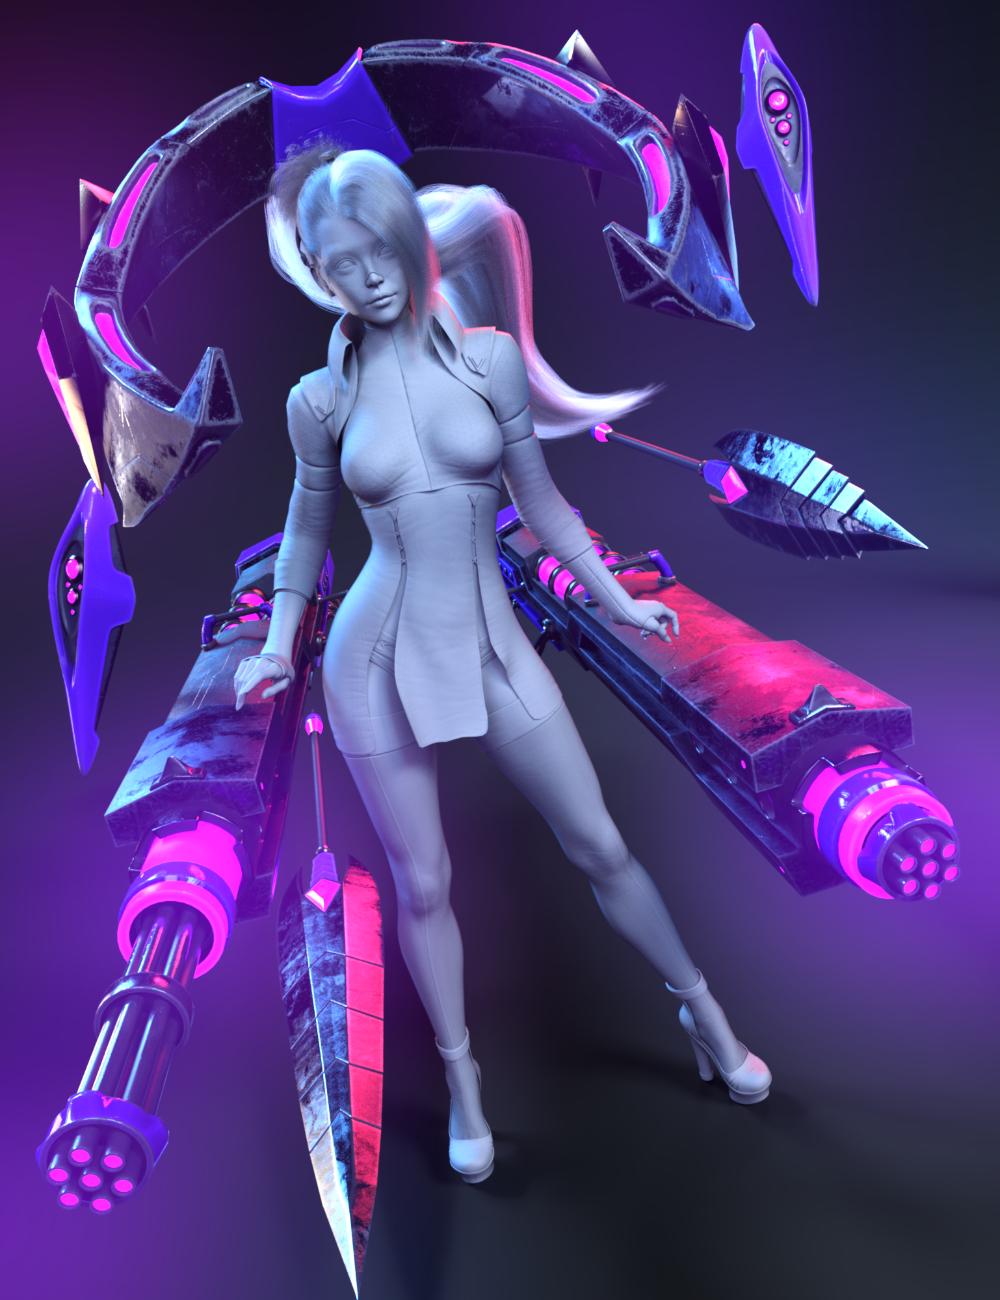 Tenebris Weapons Set for Genesis 8.1 Females by: HM, 3D Models by Daz 3D